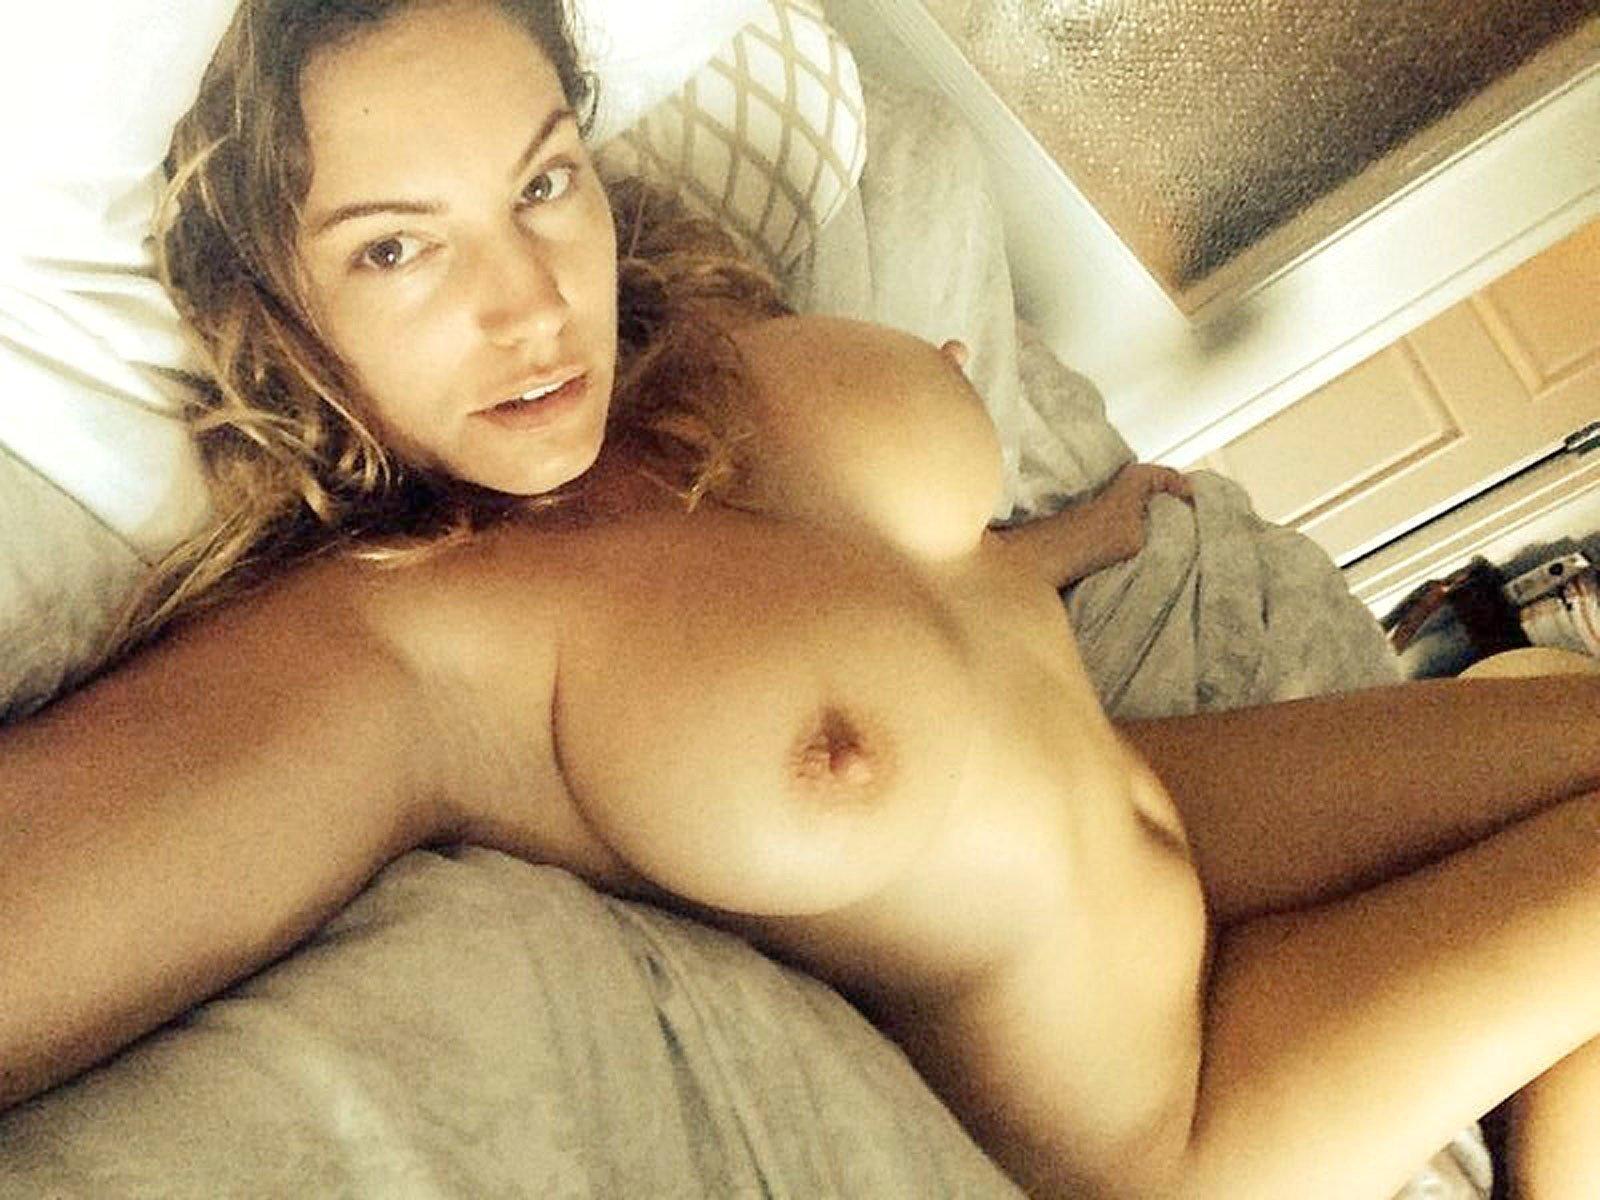 Celebrity nude photo leaks